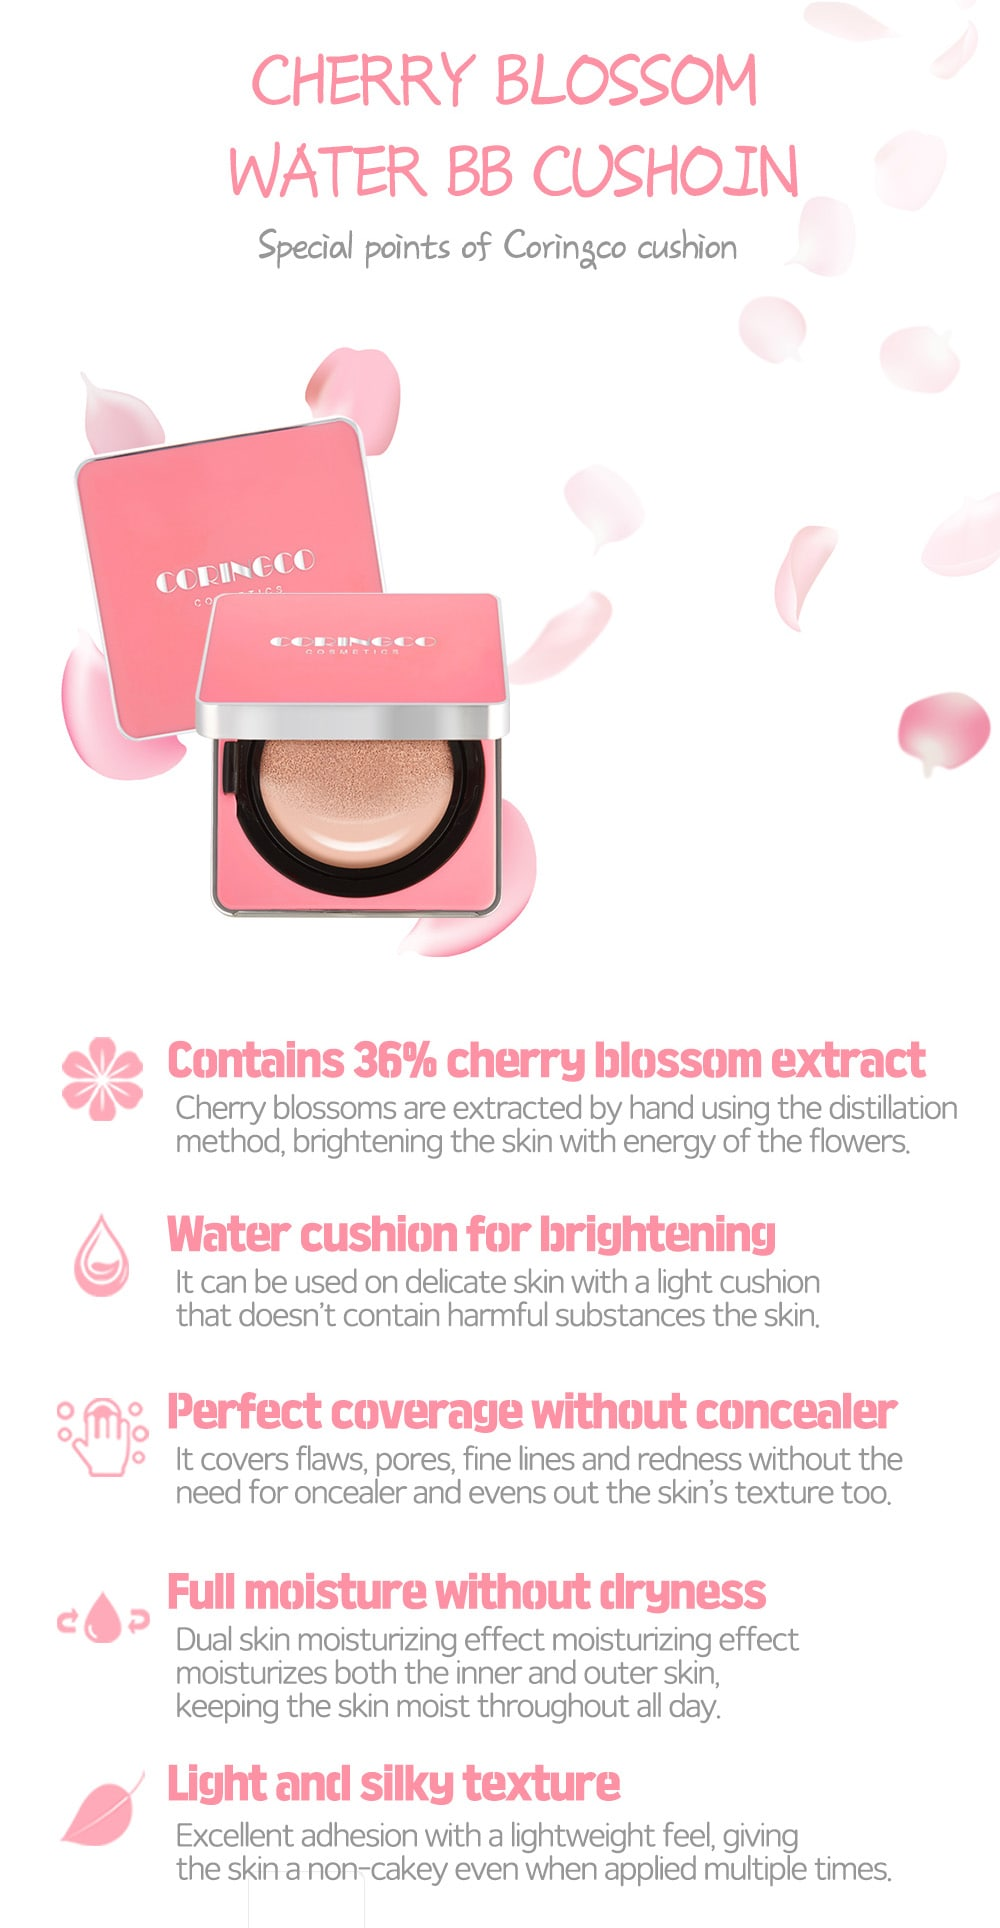 Cherry Blossom BB Cushion - Benefits